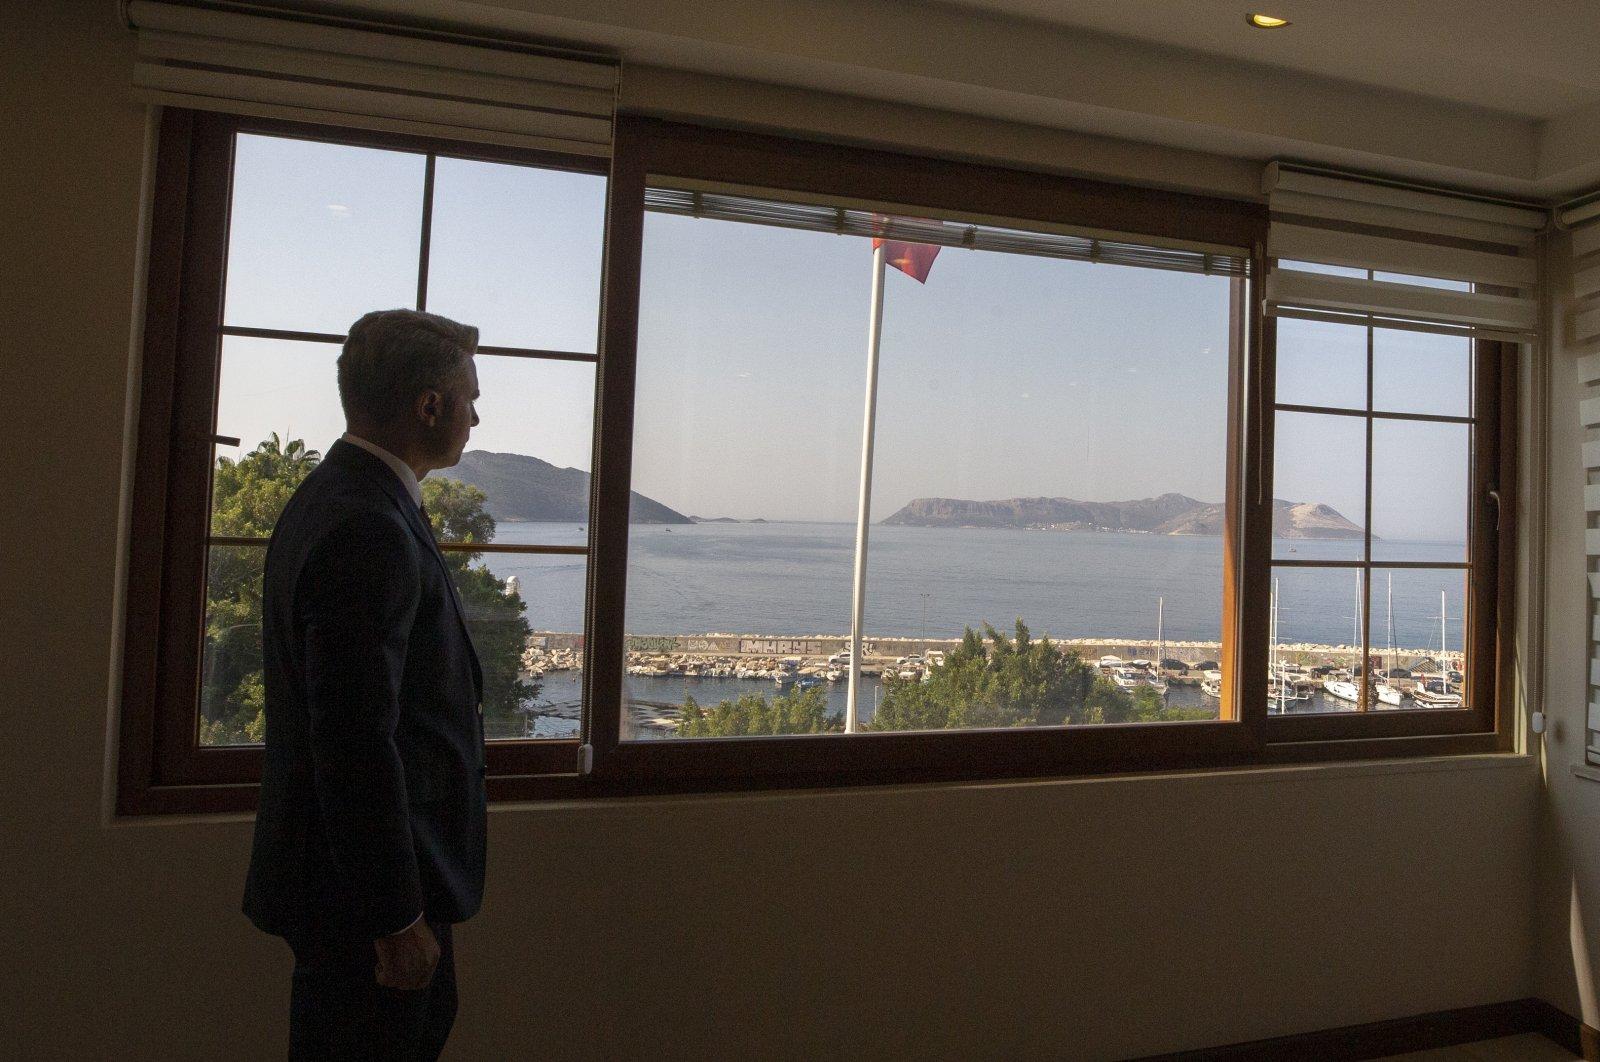 Kaş District Governor Şaban Arda Yazıcı looks at the island of Kastellorizo from the window of his office in Kaş, Antalya province, southern Turkey, Sept. 18, 2020. (AA Photo)